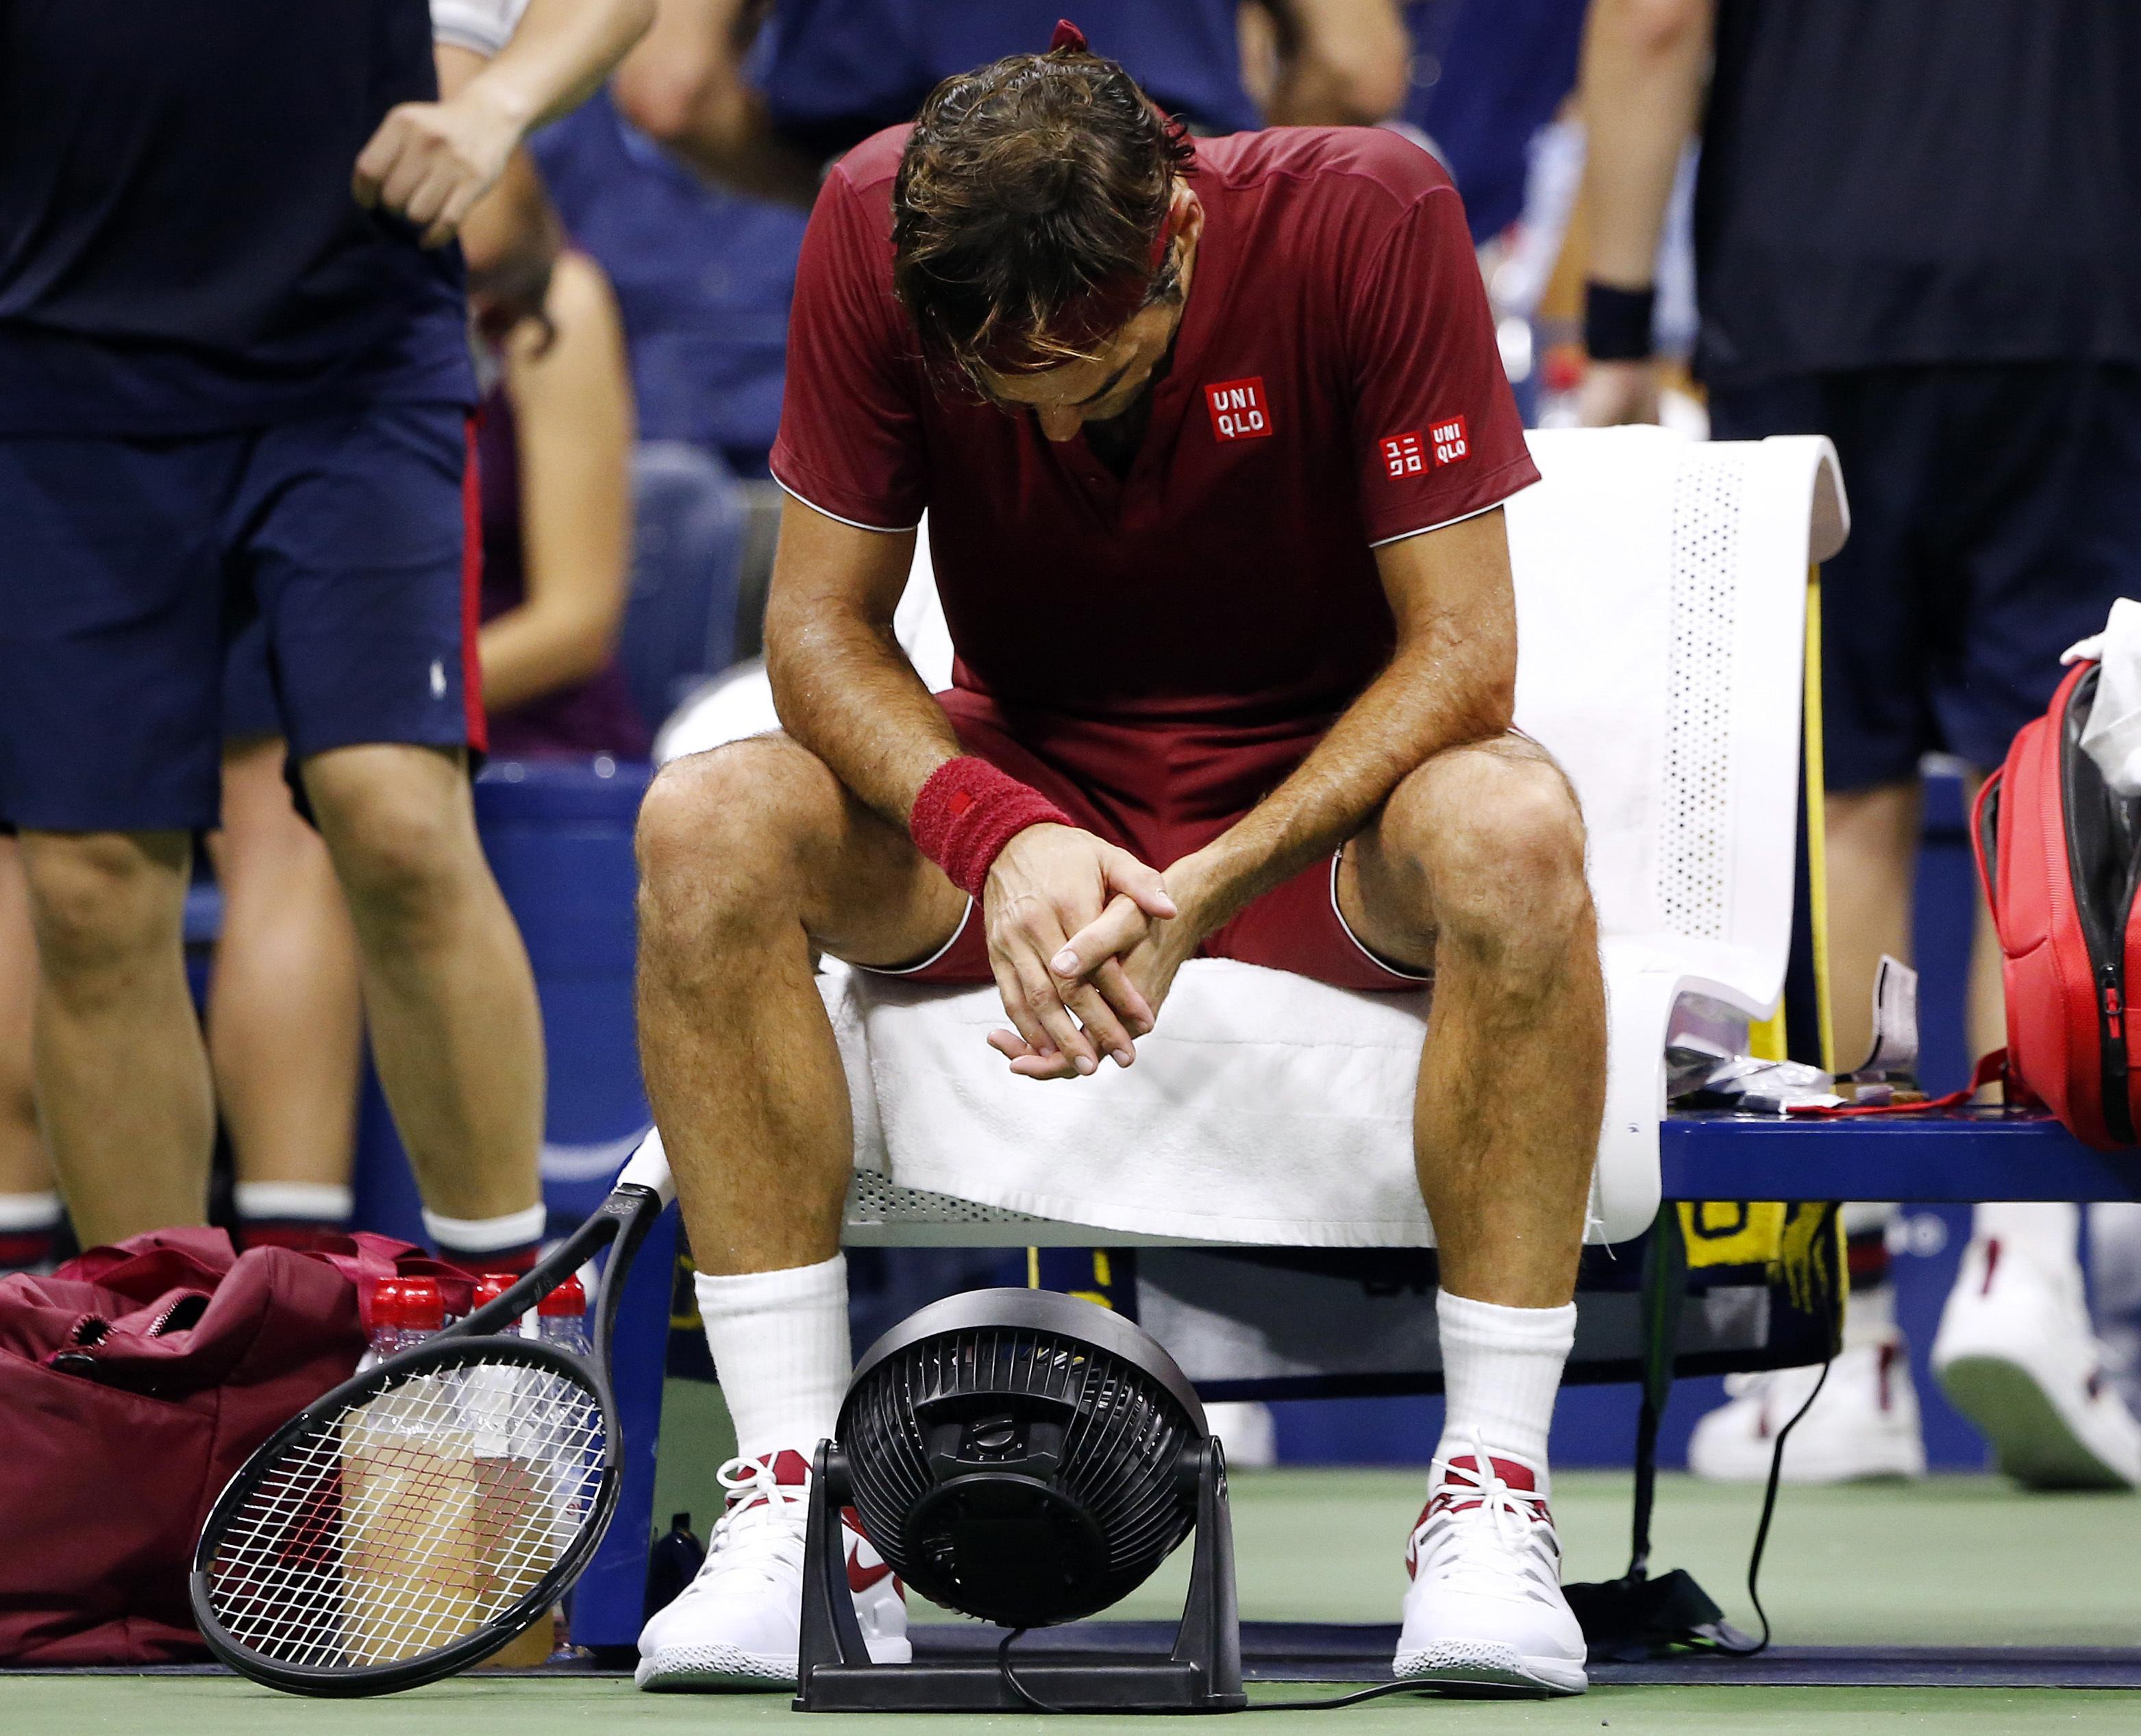 Tennis legend Roger Federer could not stop John Millman